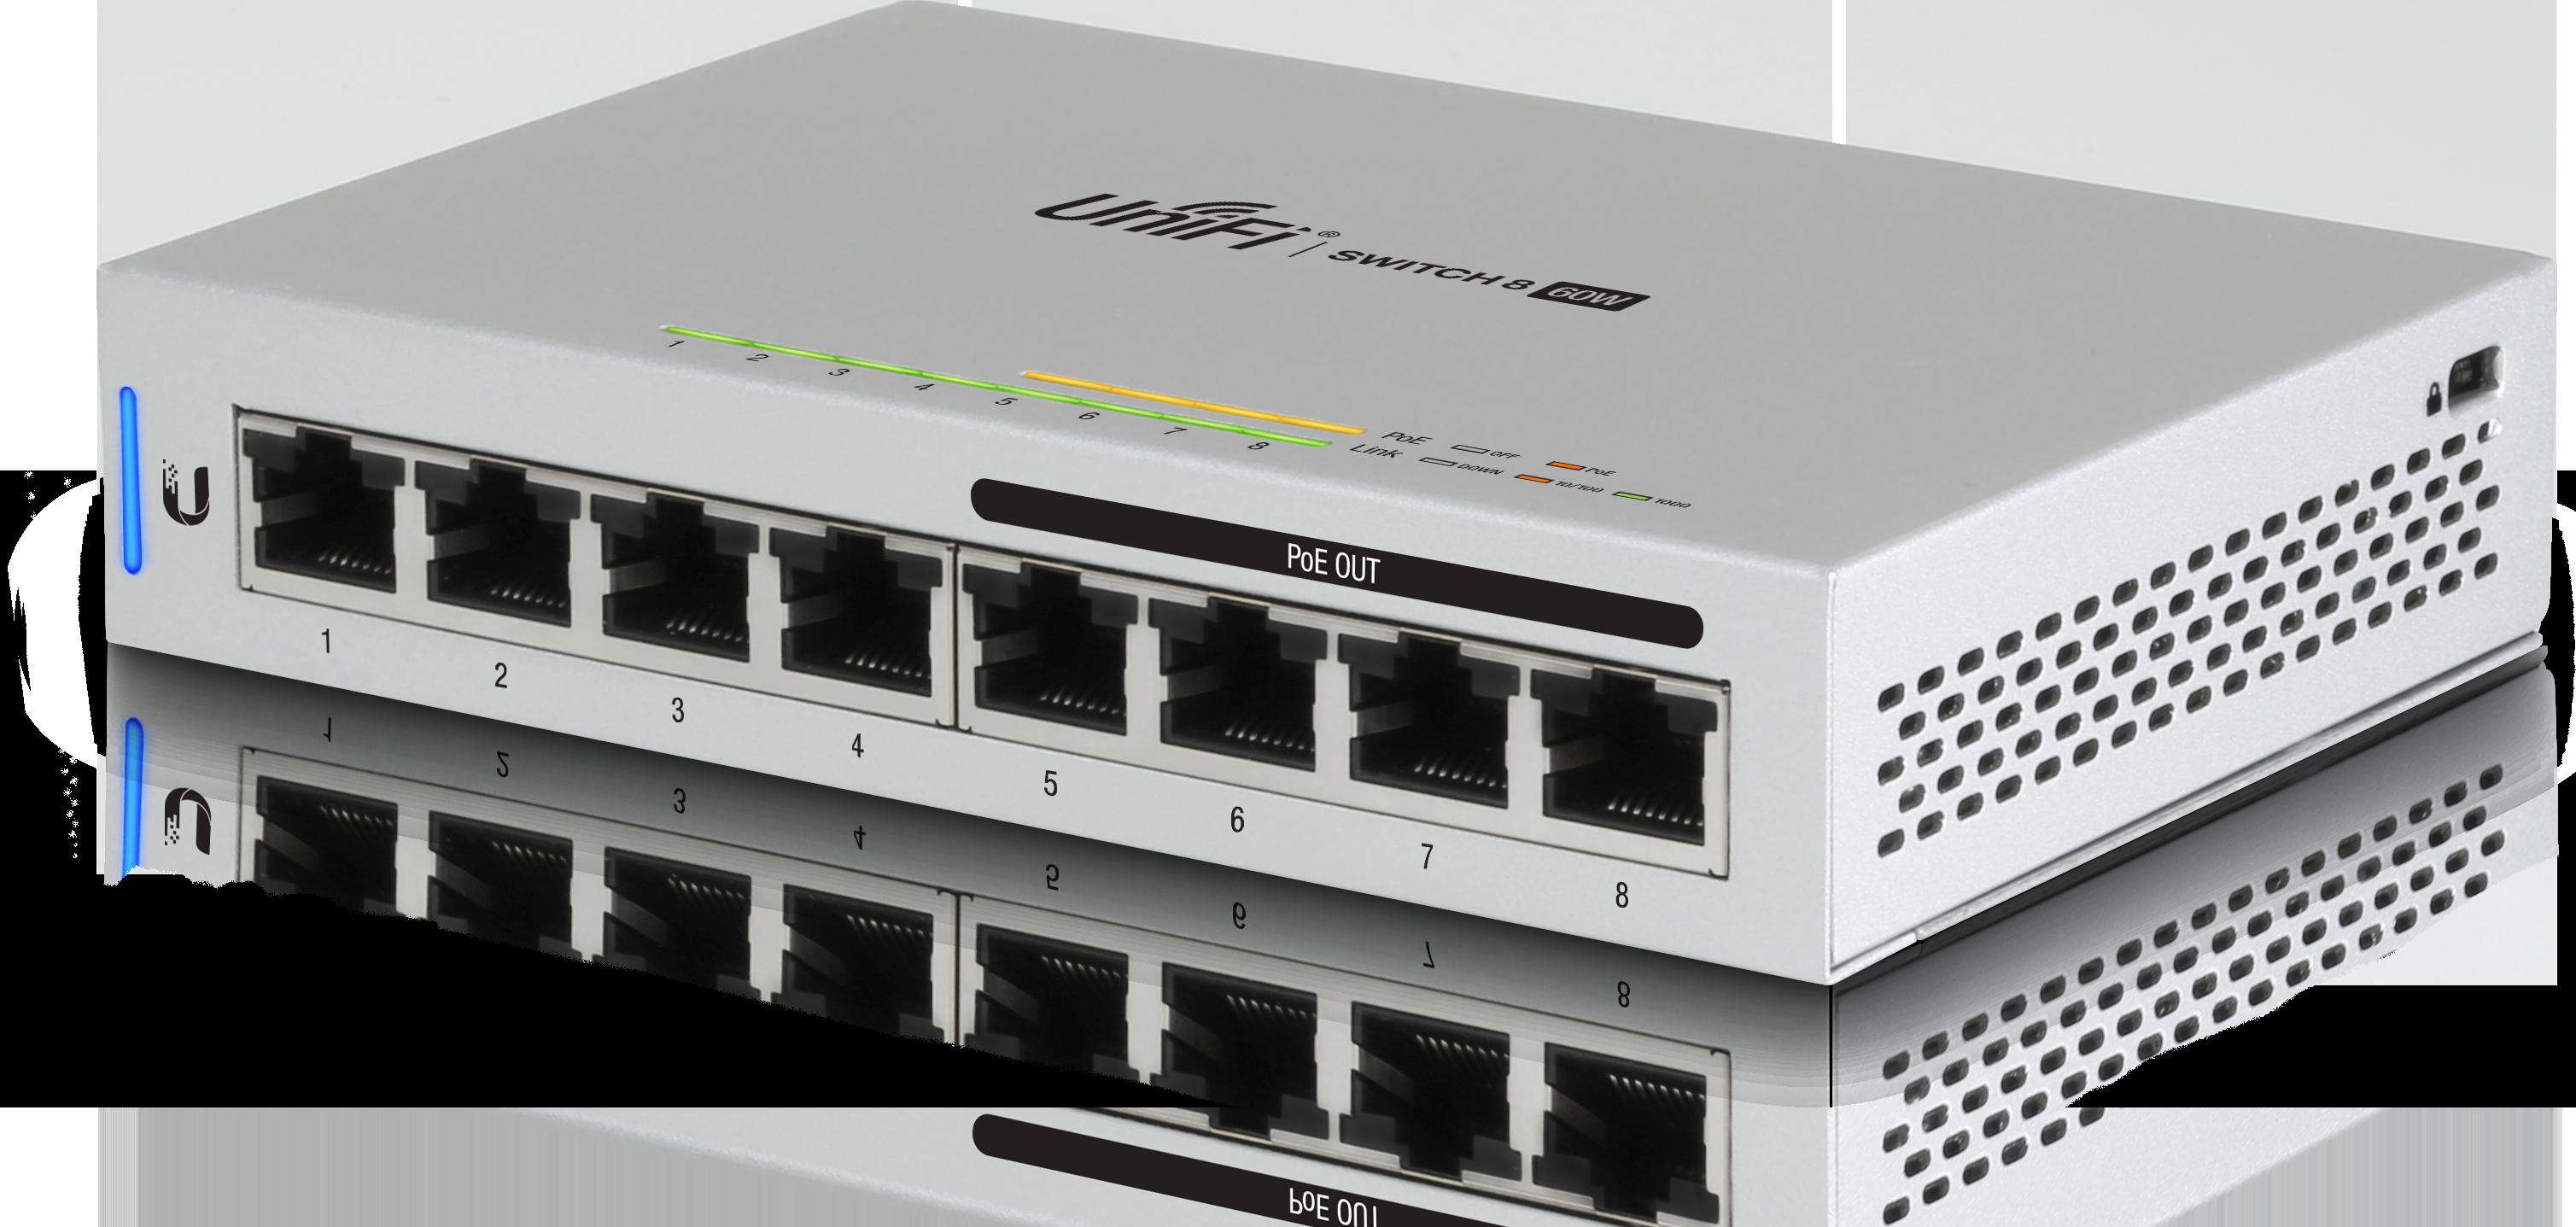 TP-Link TL-PA8010P V2 1-Port Gigabit Passthrough Powerline startkit